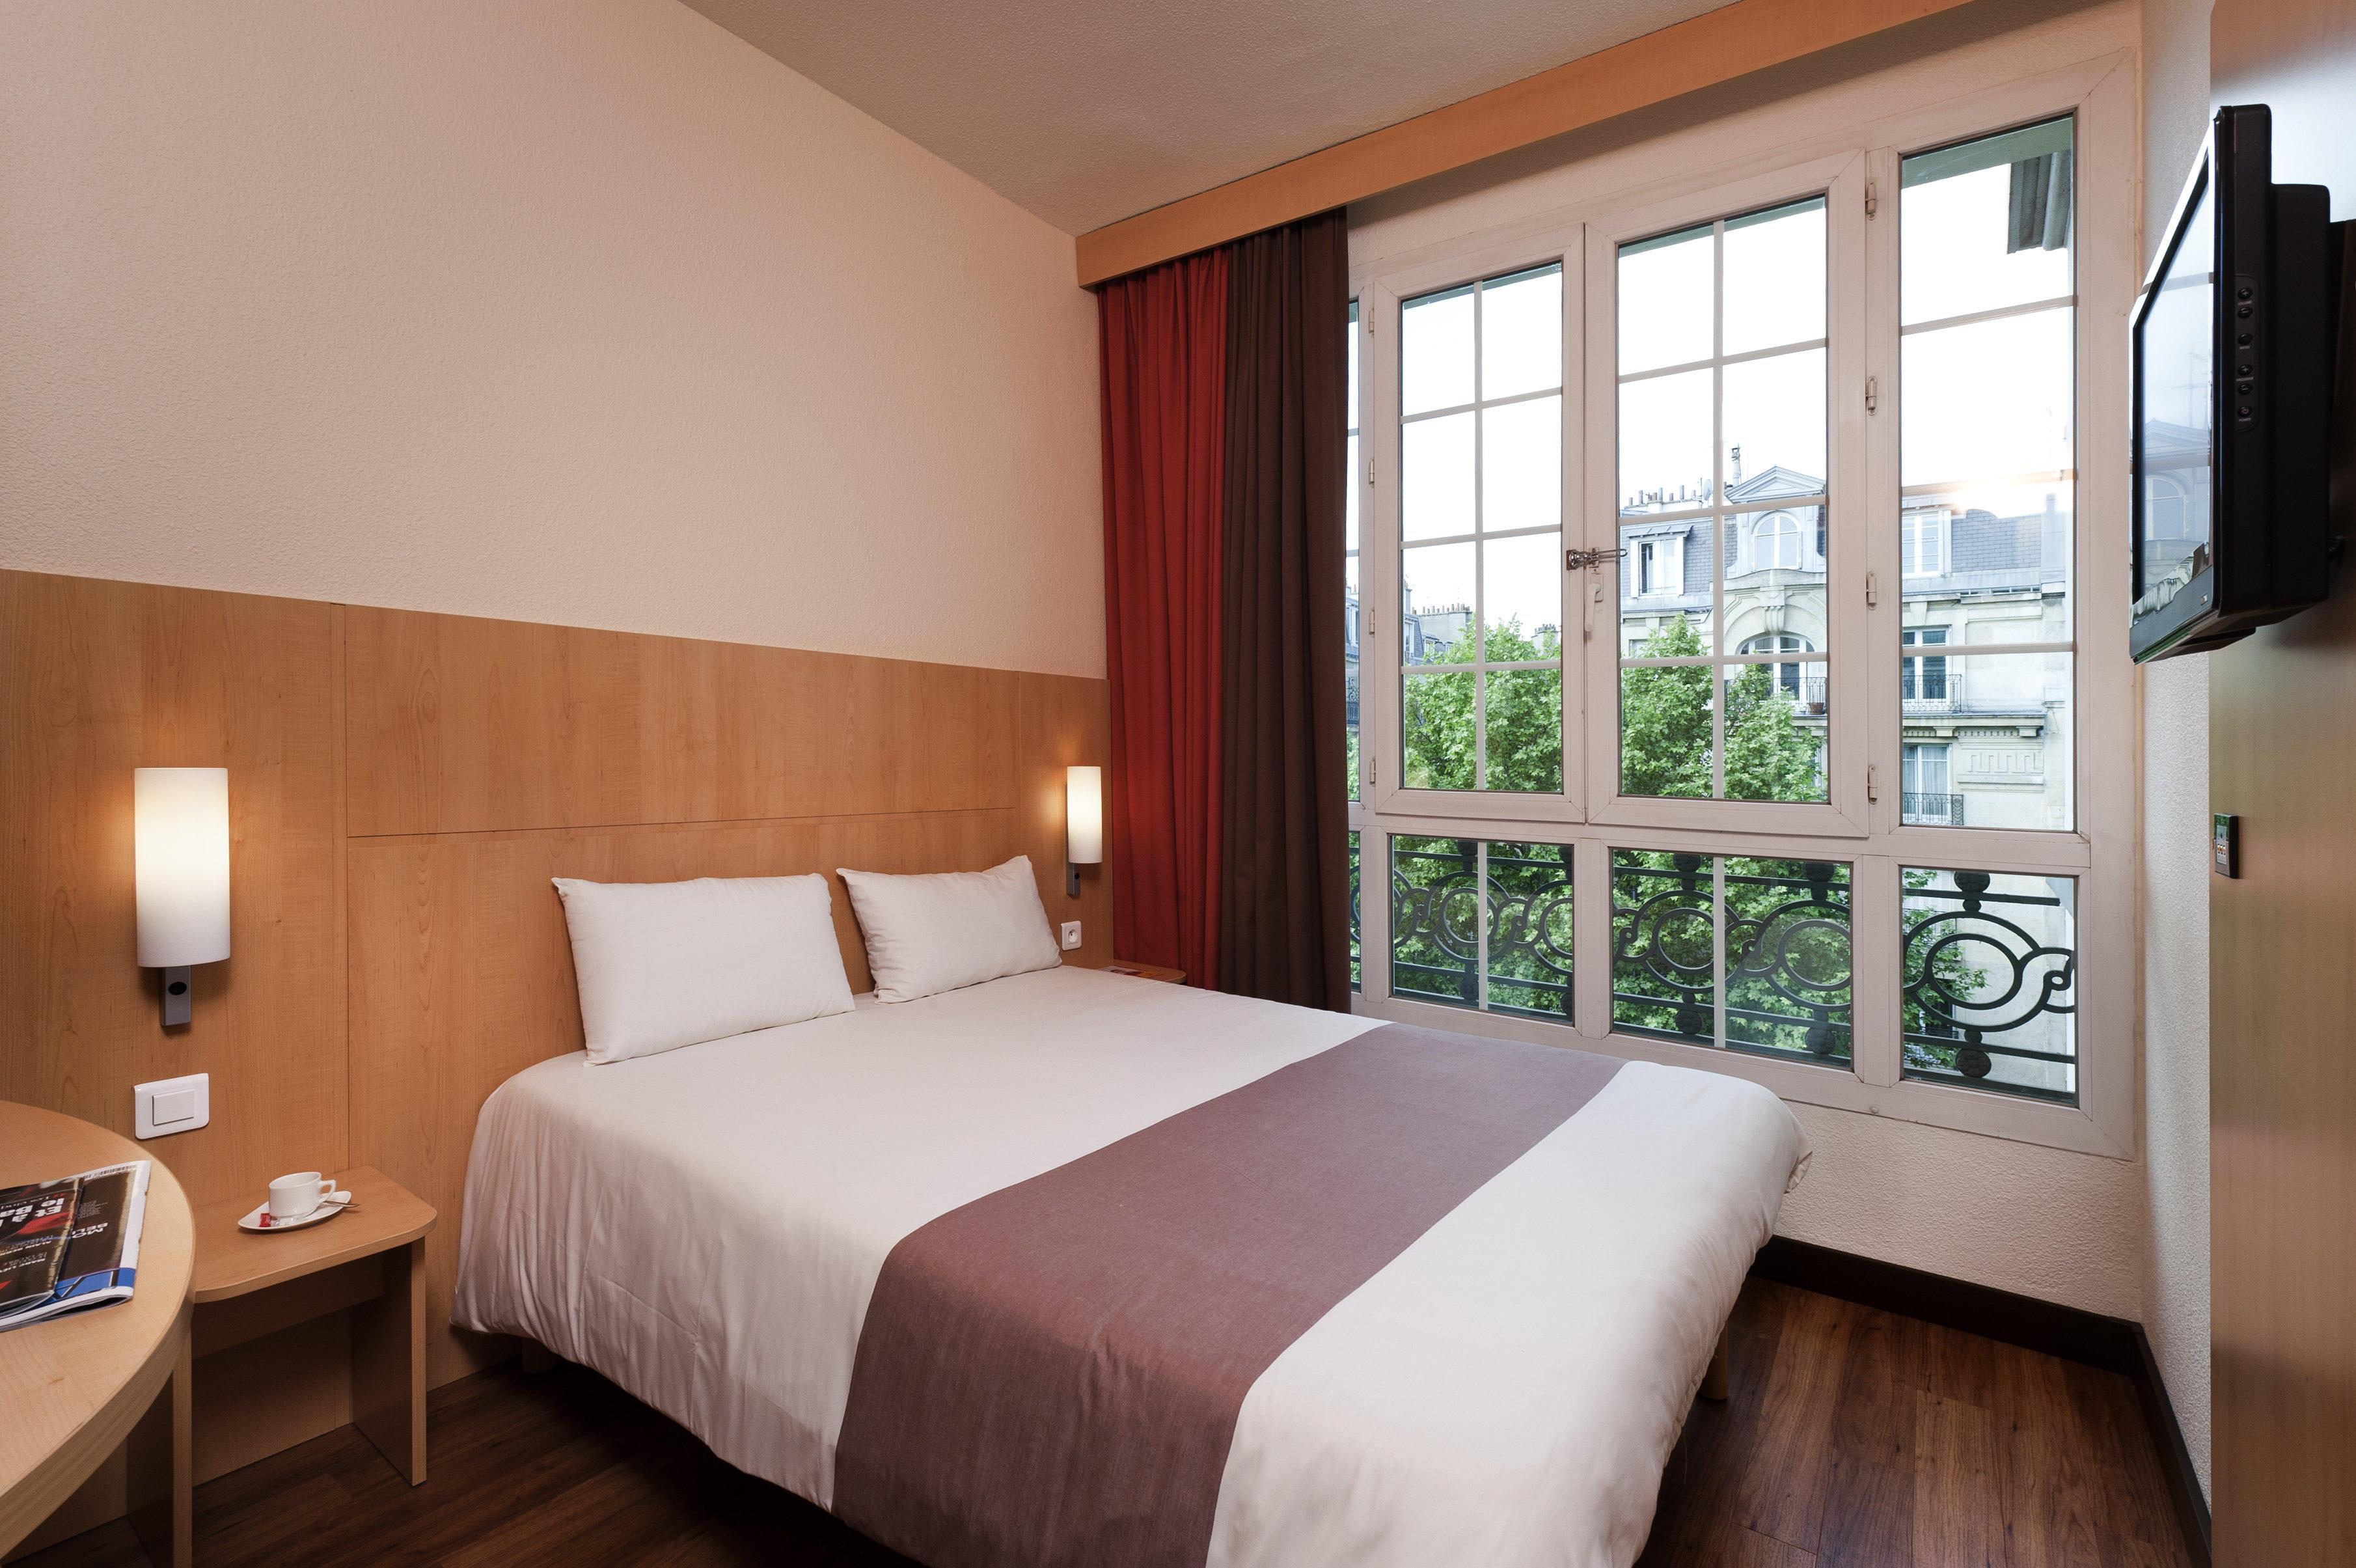 Ibis hotel paris ornano montmartre nord in paris holidaycheck gro raum paris frankreich - Ibis porte de clignancourt ...